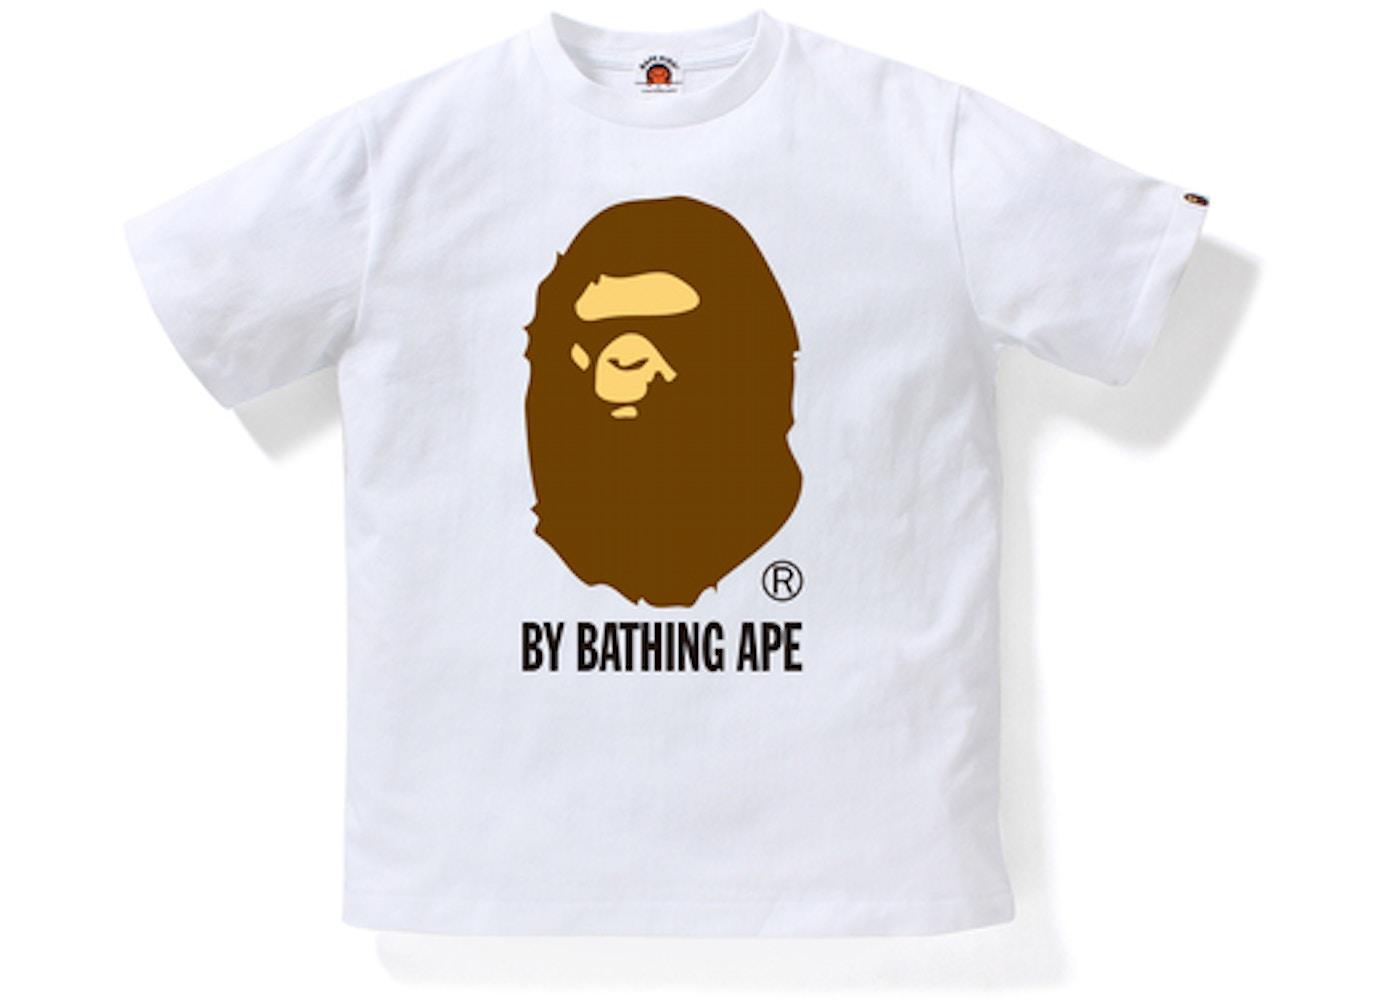 BAPE By Bathing Ape Tee (Kids) White Brown - 94787ca0908d